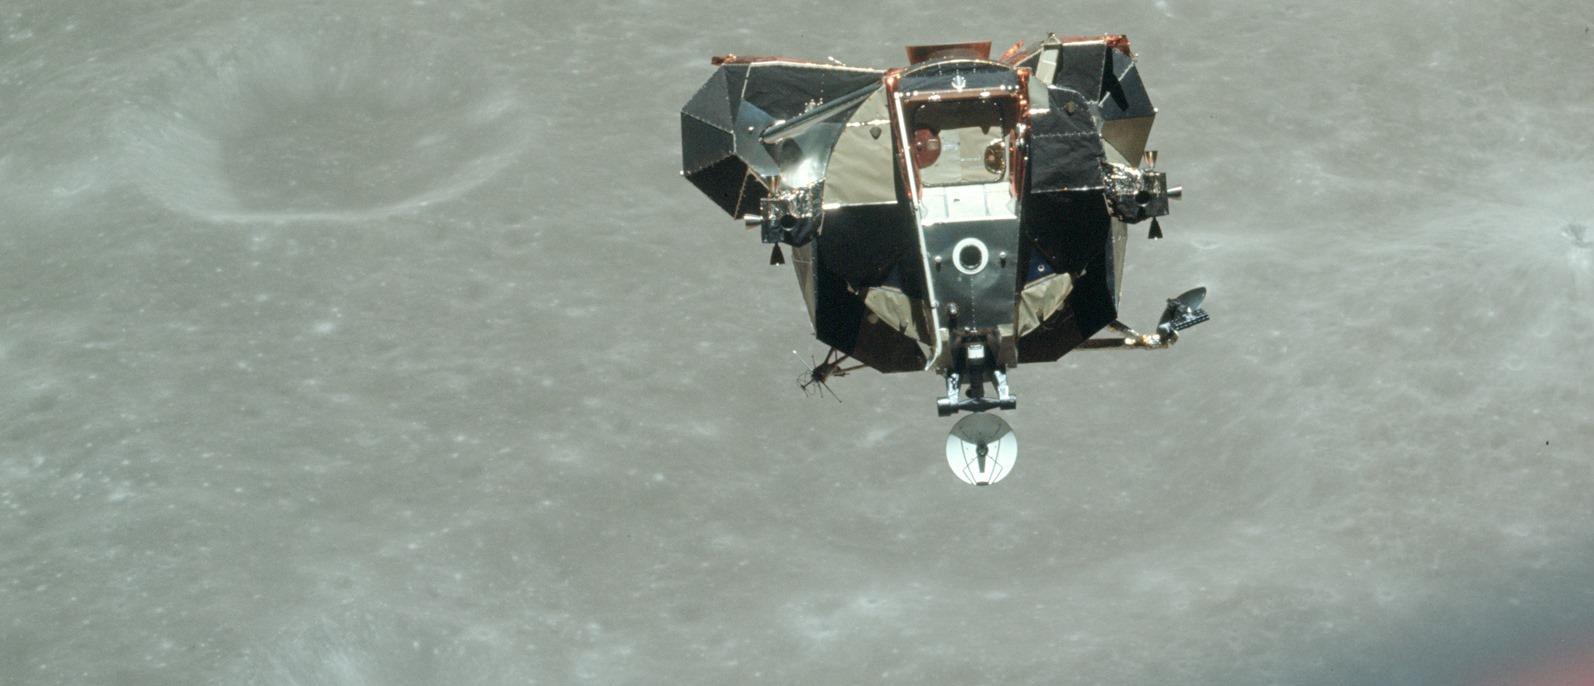 Image: Lunar module